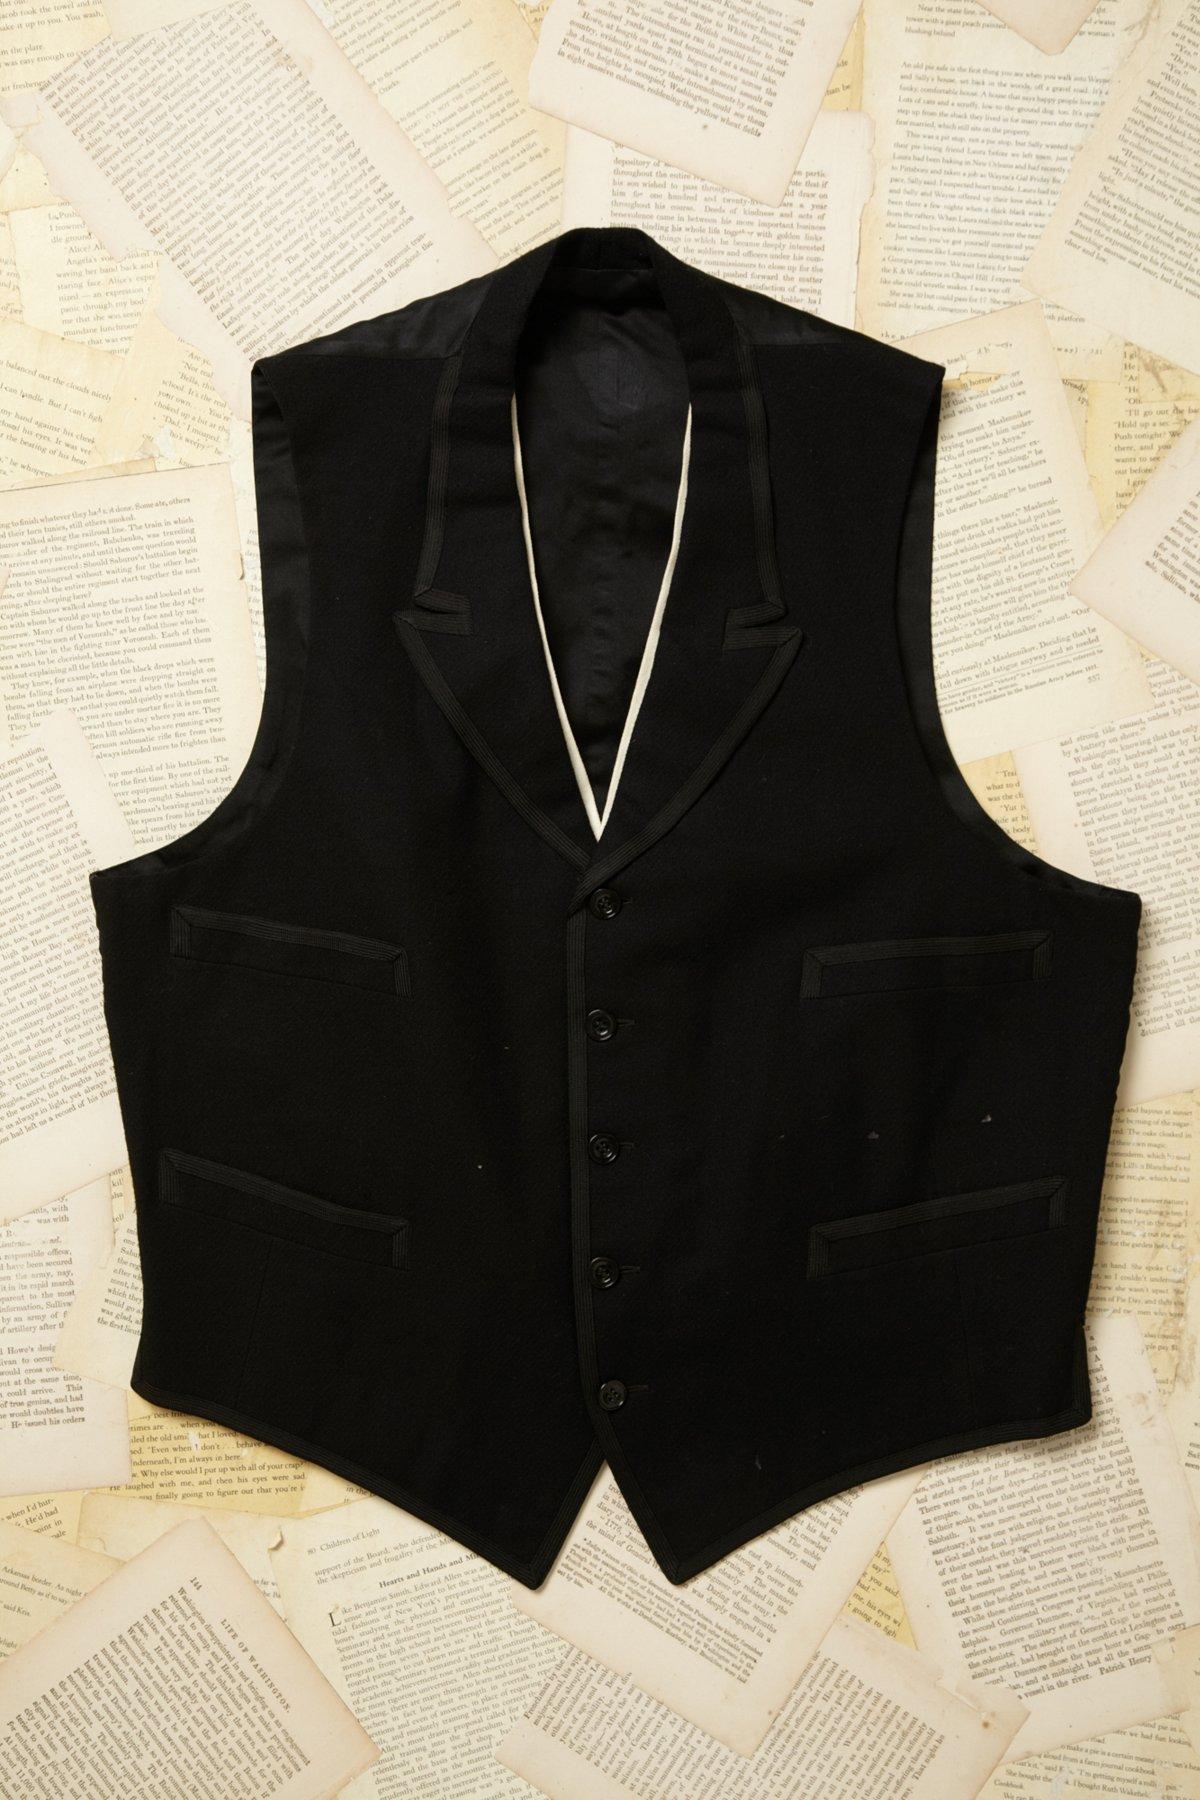 Vintage 1920s Wool Vest